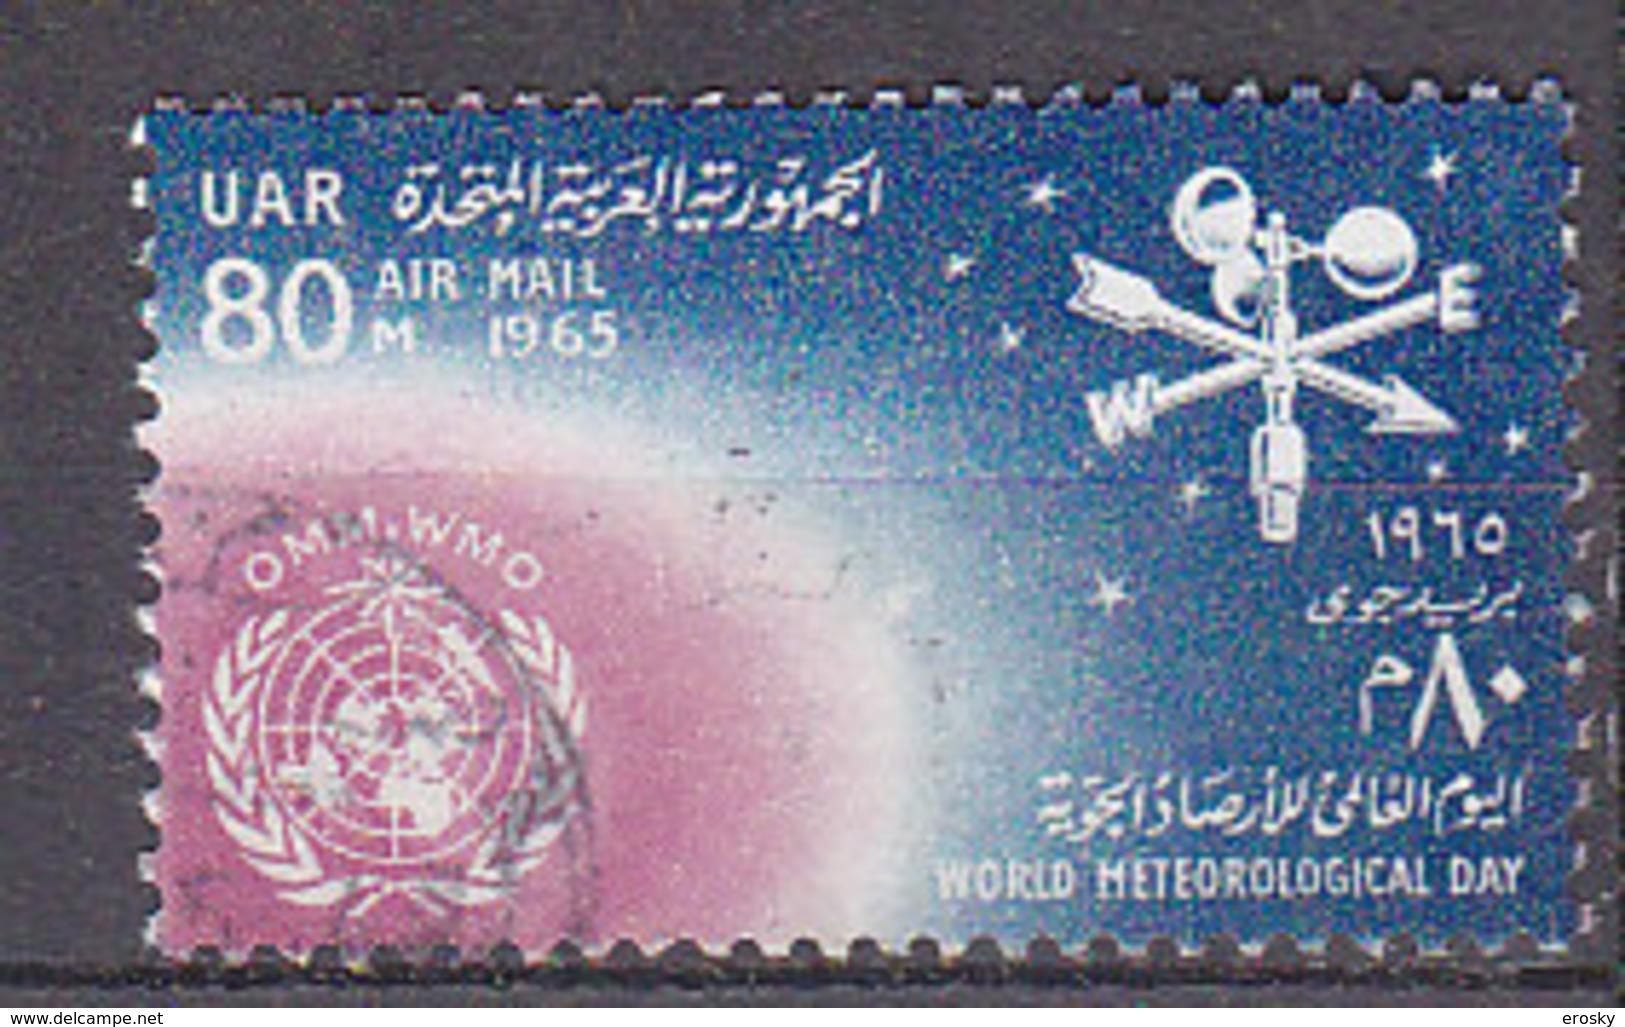 A0795 - EGYPTE EGYPT AERIENNE Yv N°95 - Poste Aérienne